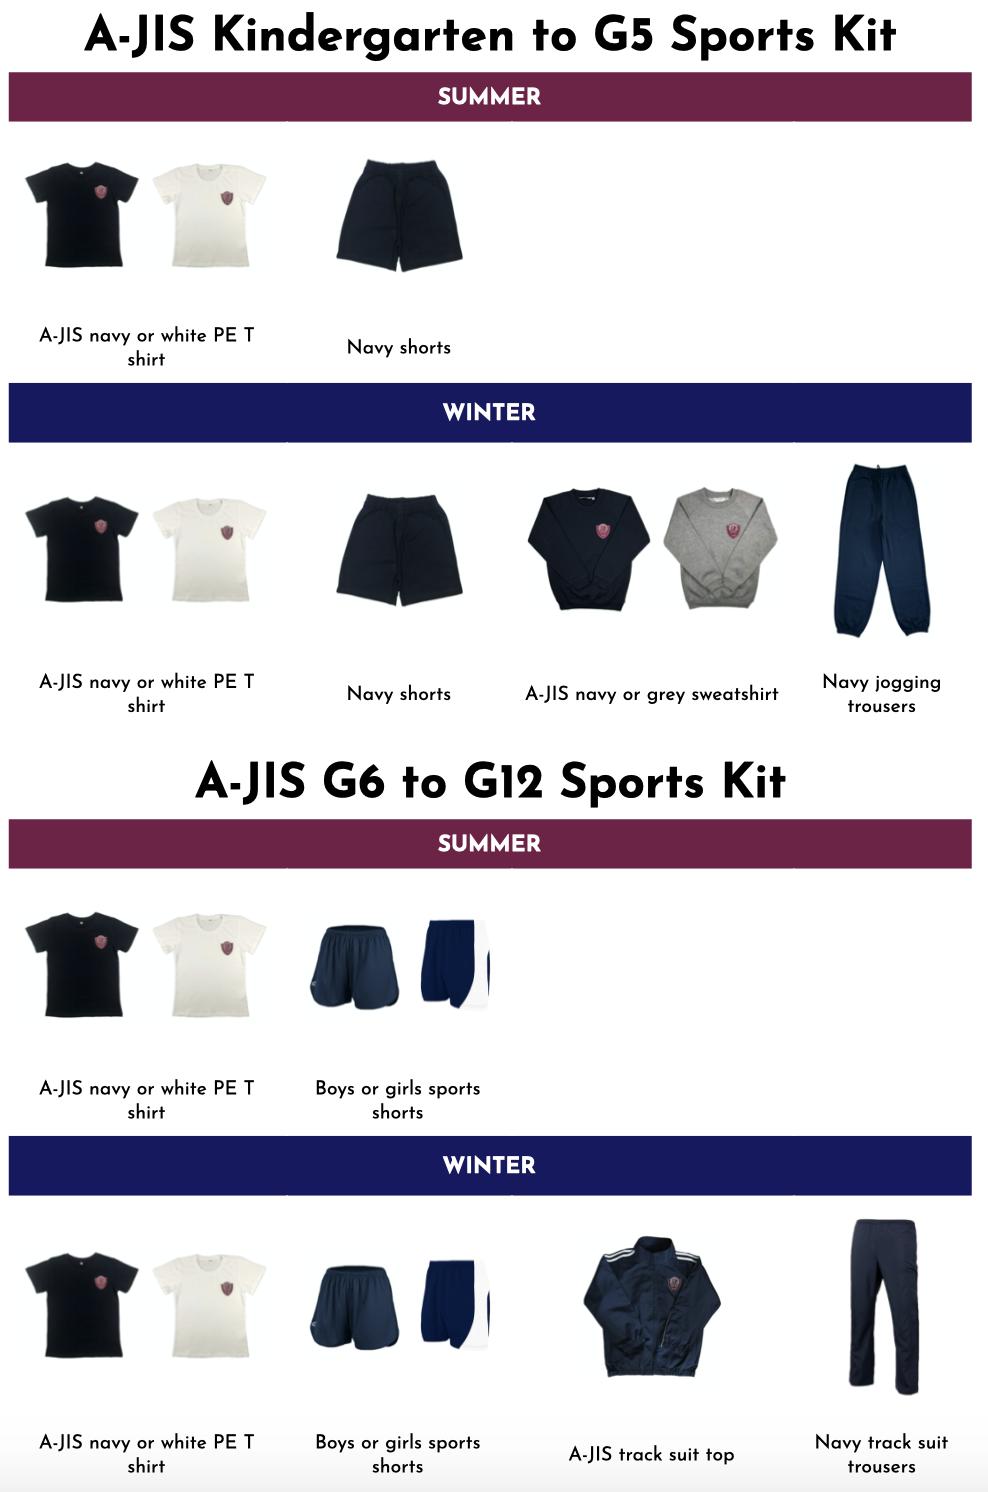 ajis-uniform-guide-2020-8.png